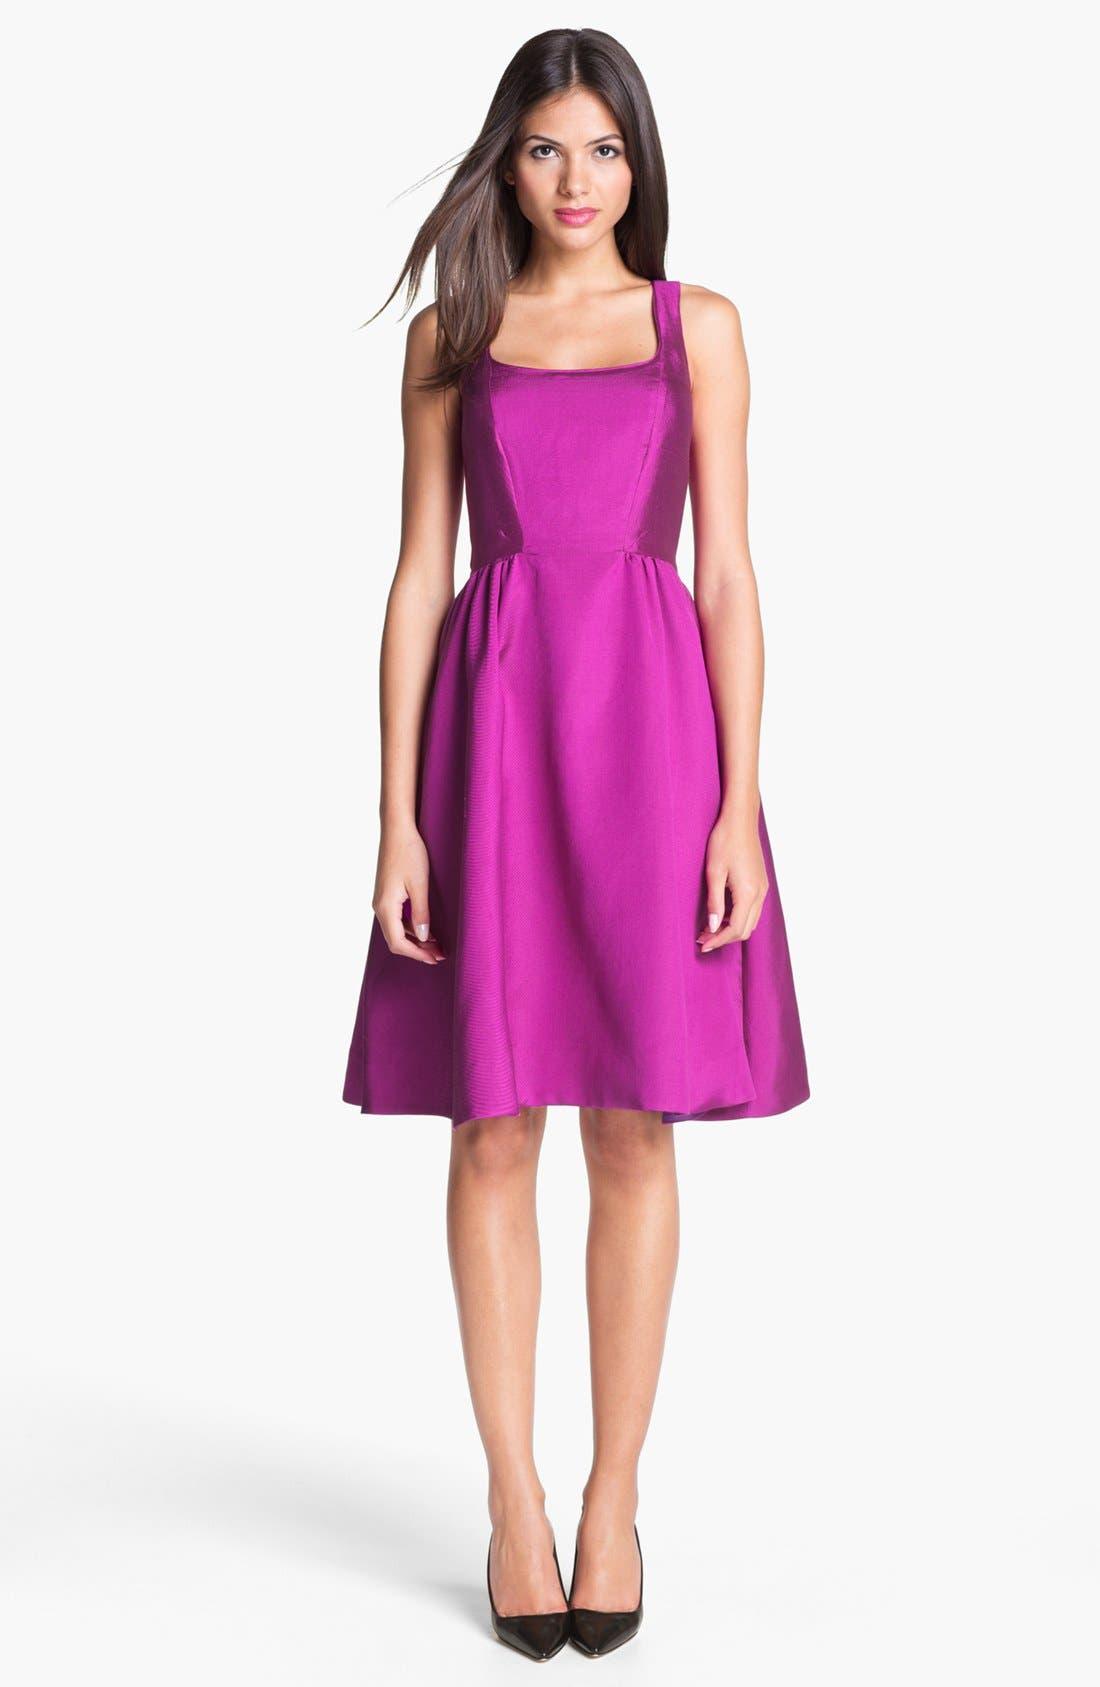 KATE SPADE NEW YORK, 'landry' silk blend fit & flare dress, Main thumbnail 1, color, 500